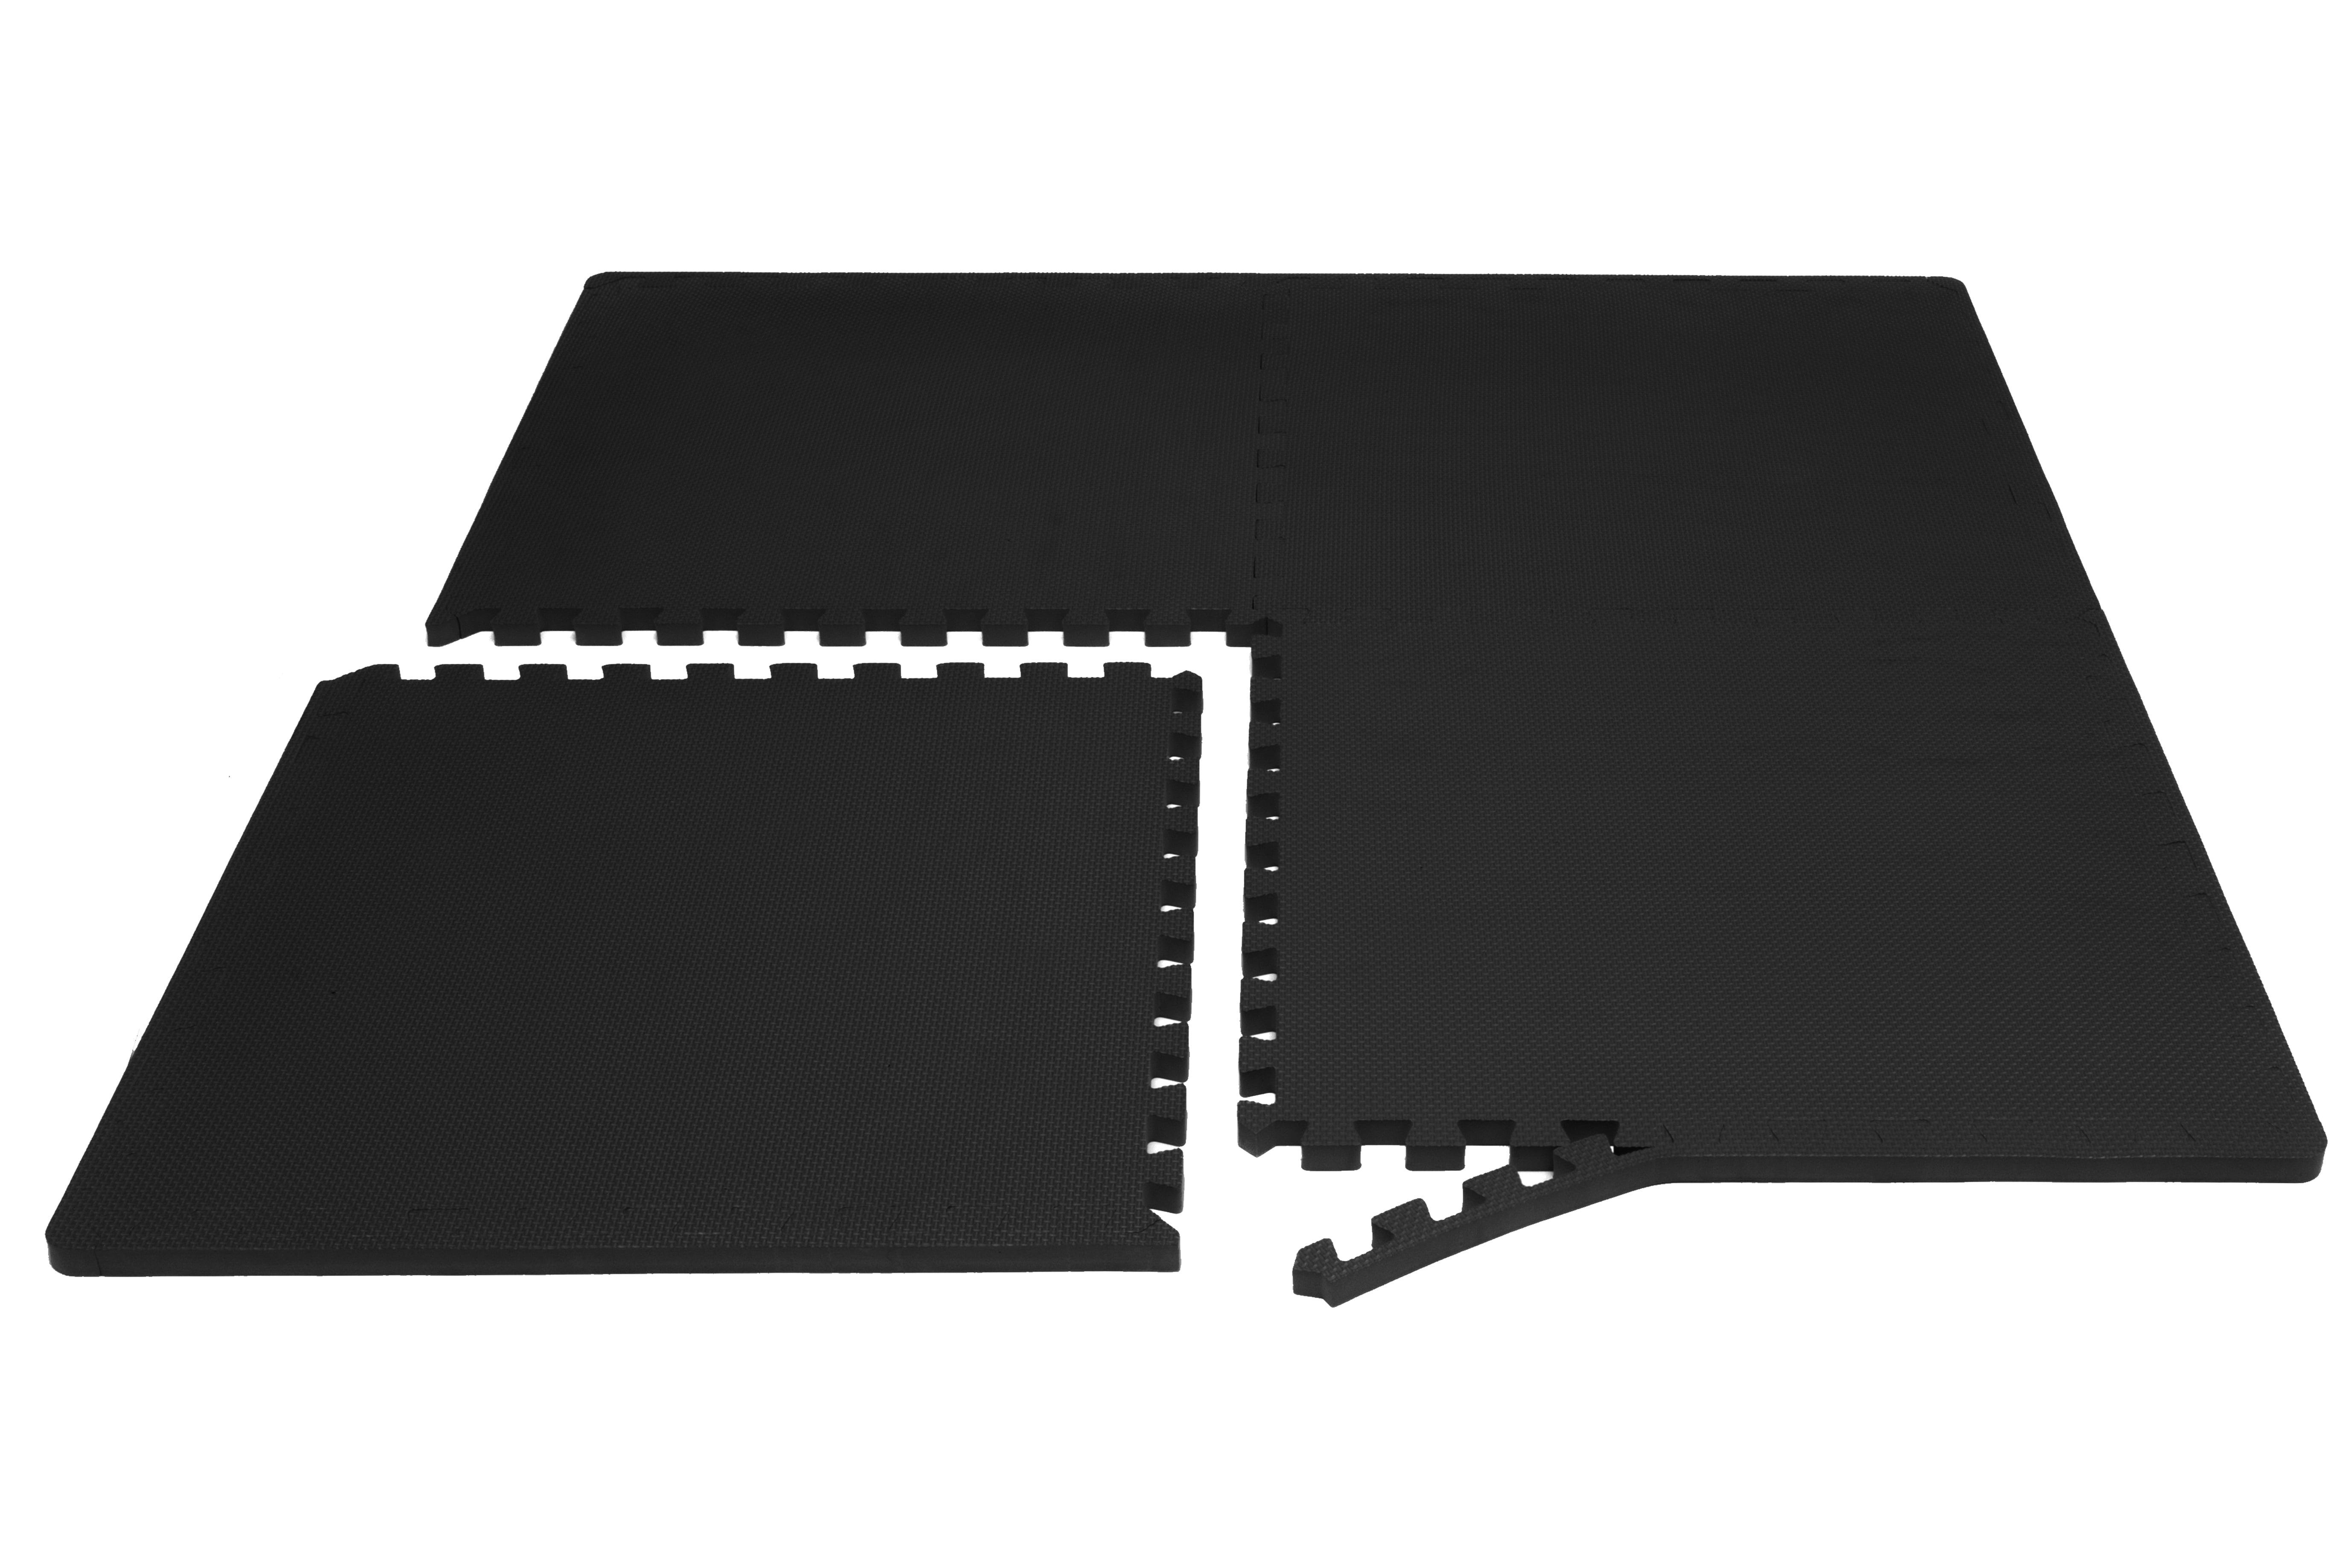 printed wood mats product foam floor interlocking forest thick grain